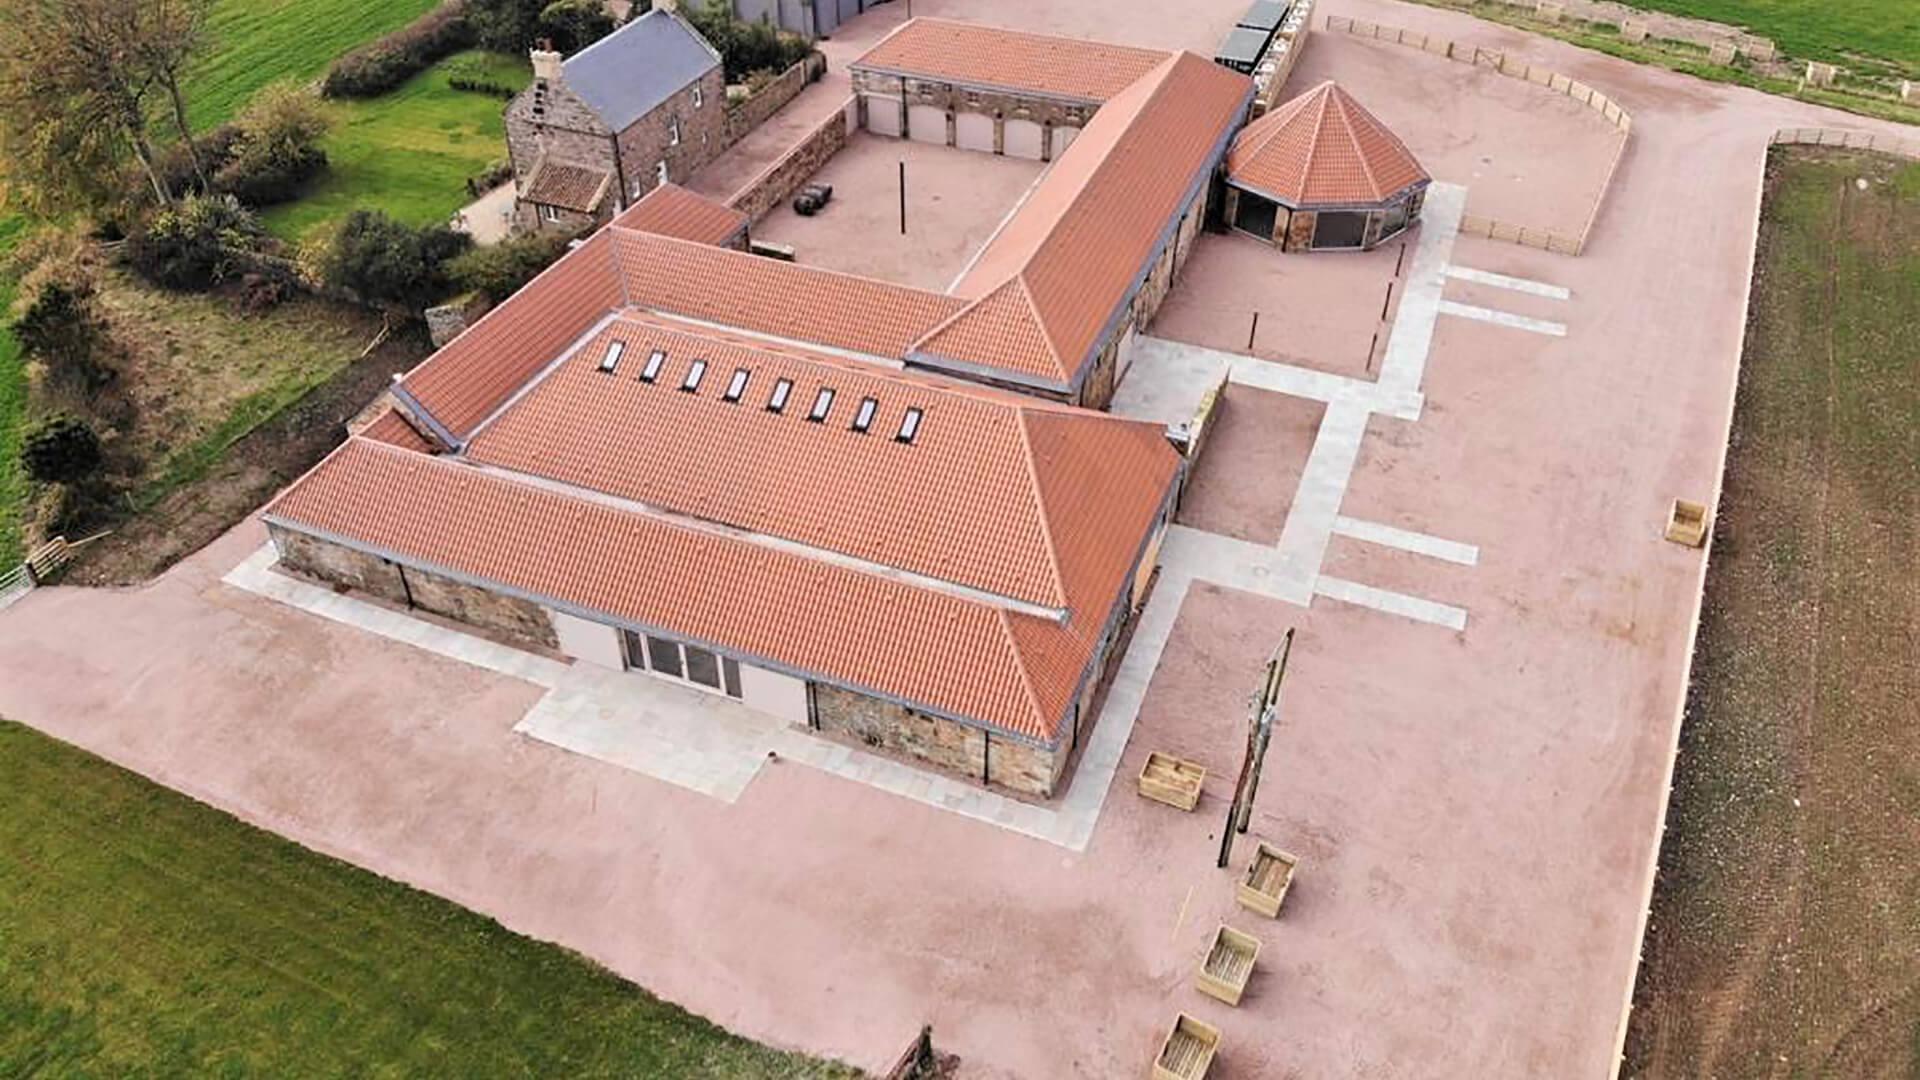 Falside Mill Venue aerial view of complex